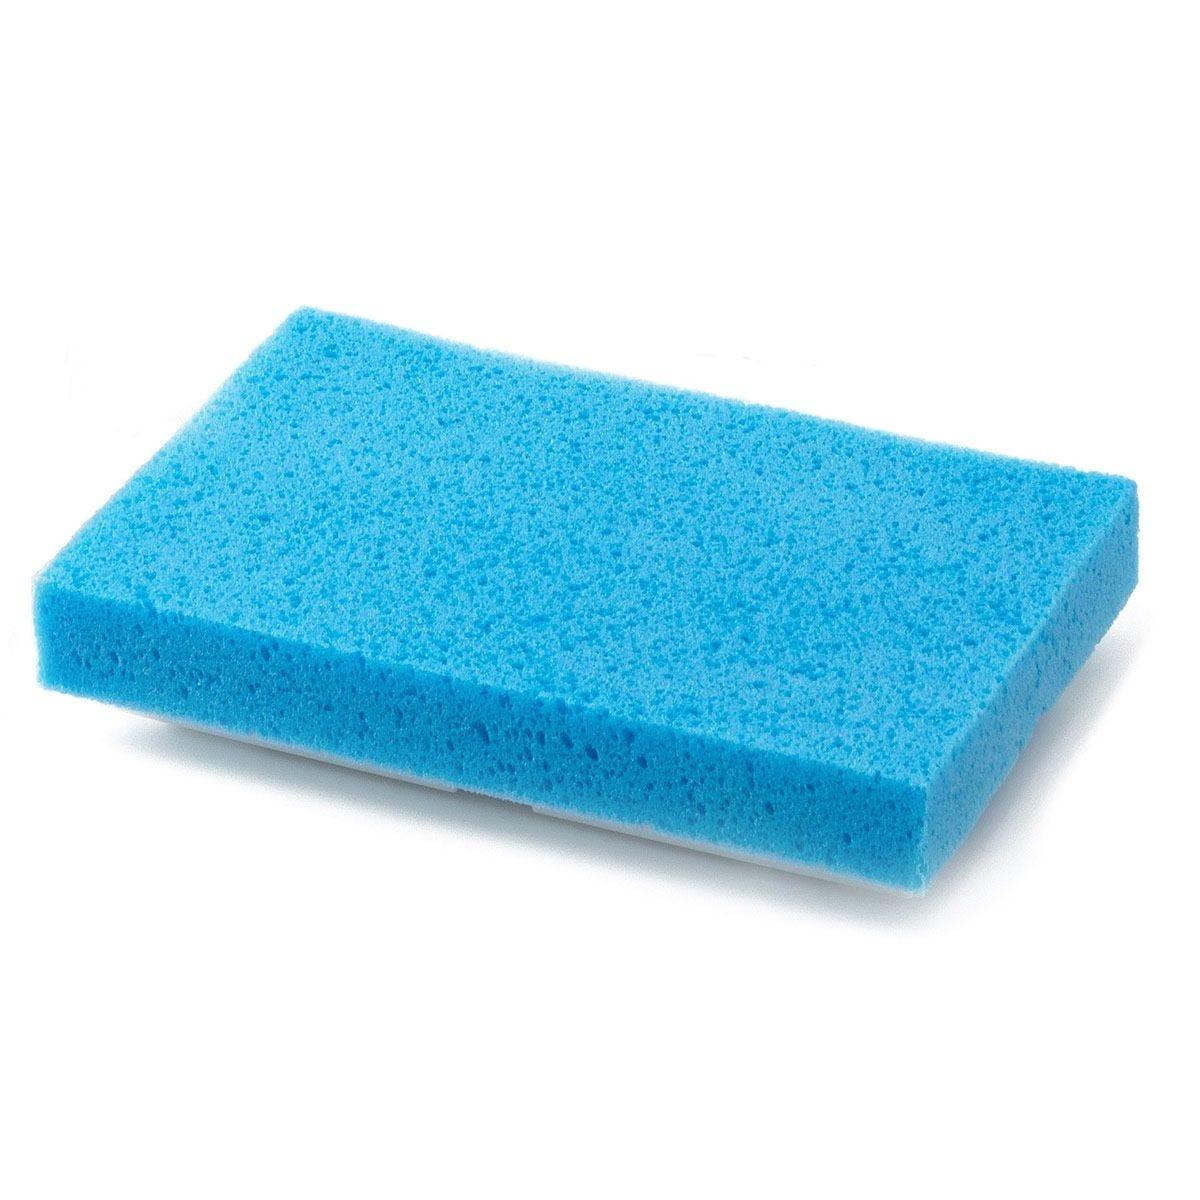 Addis Superdry Sponge Mop Refill